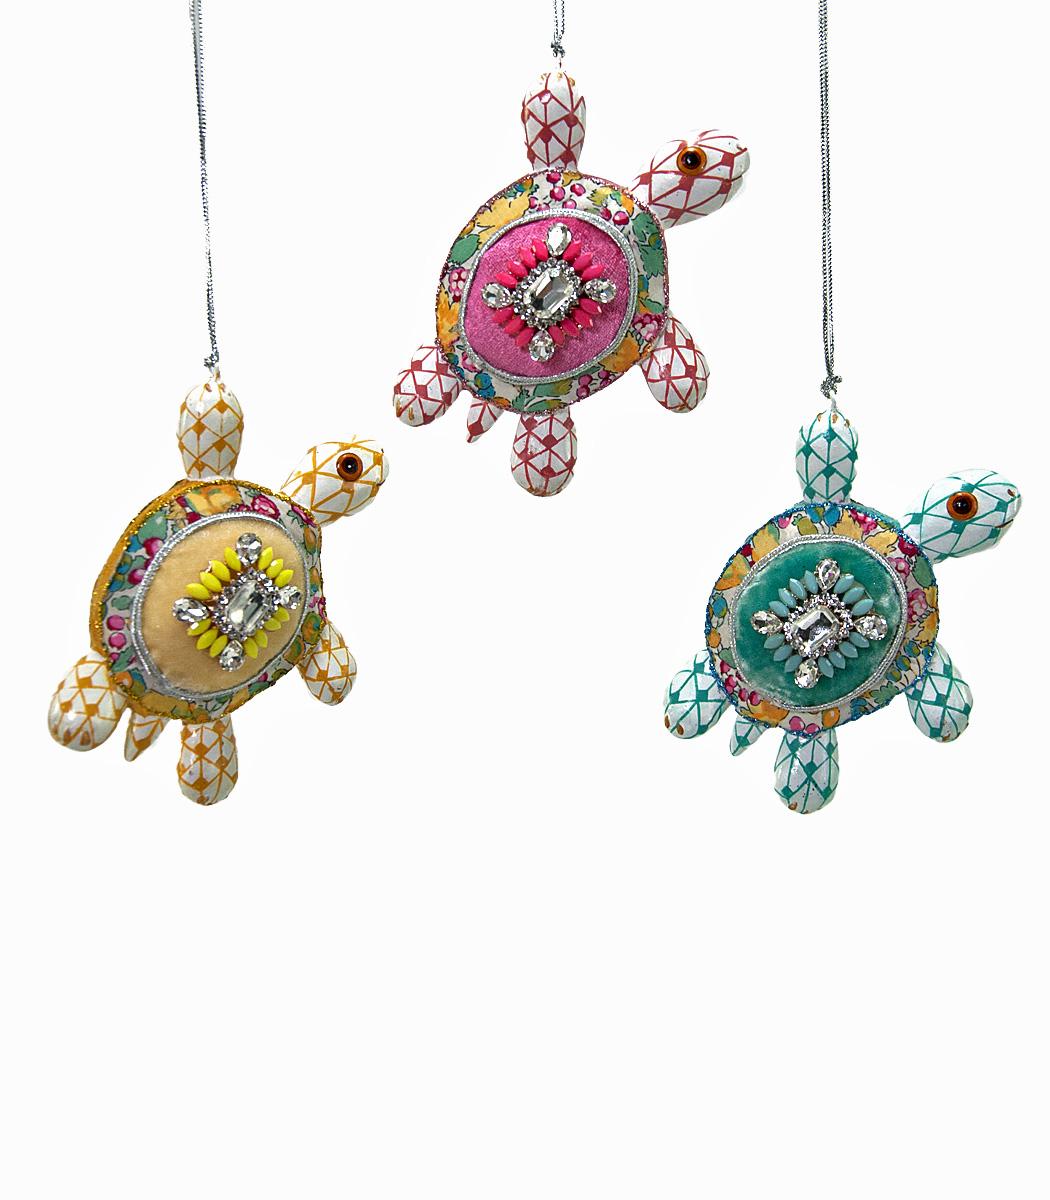 Pirouette Turtle Ornament - Assortment Of 3  28-530615